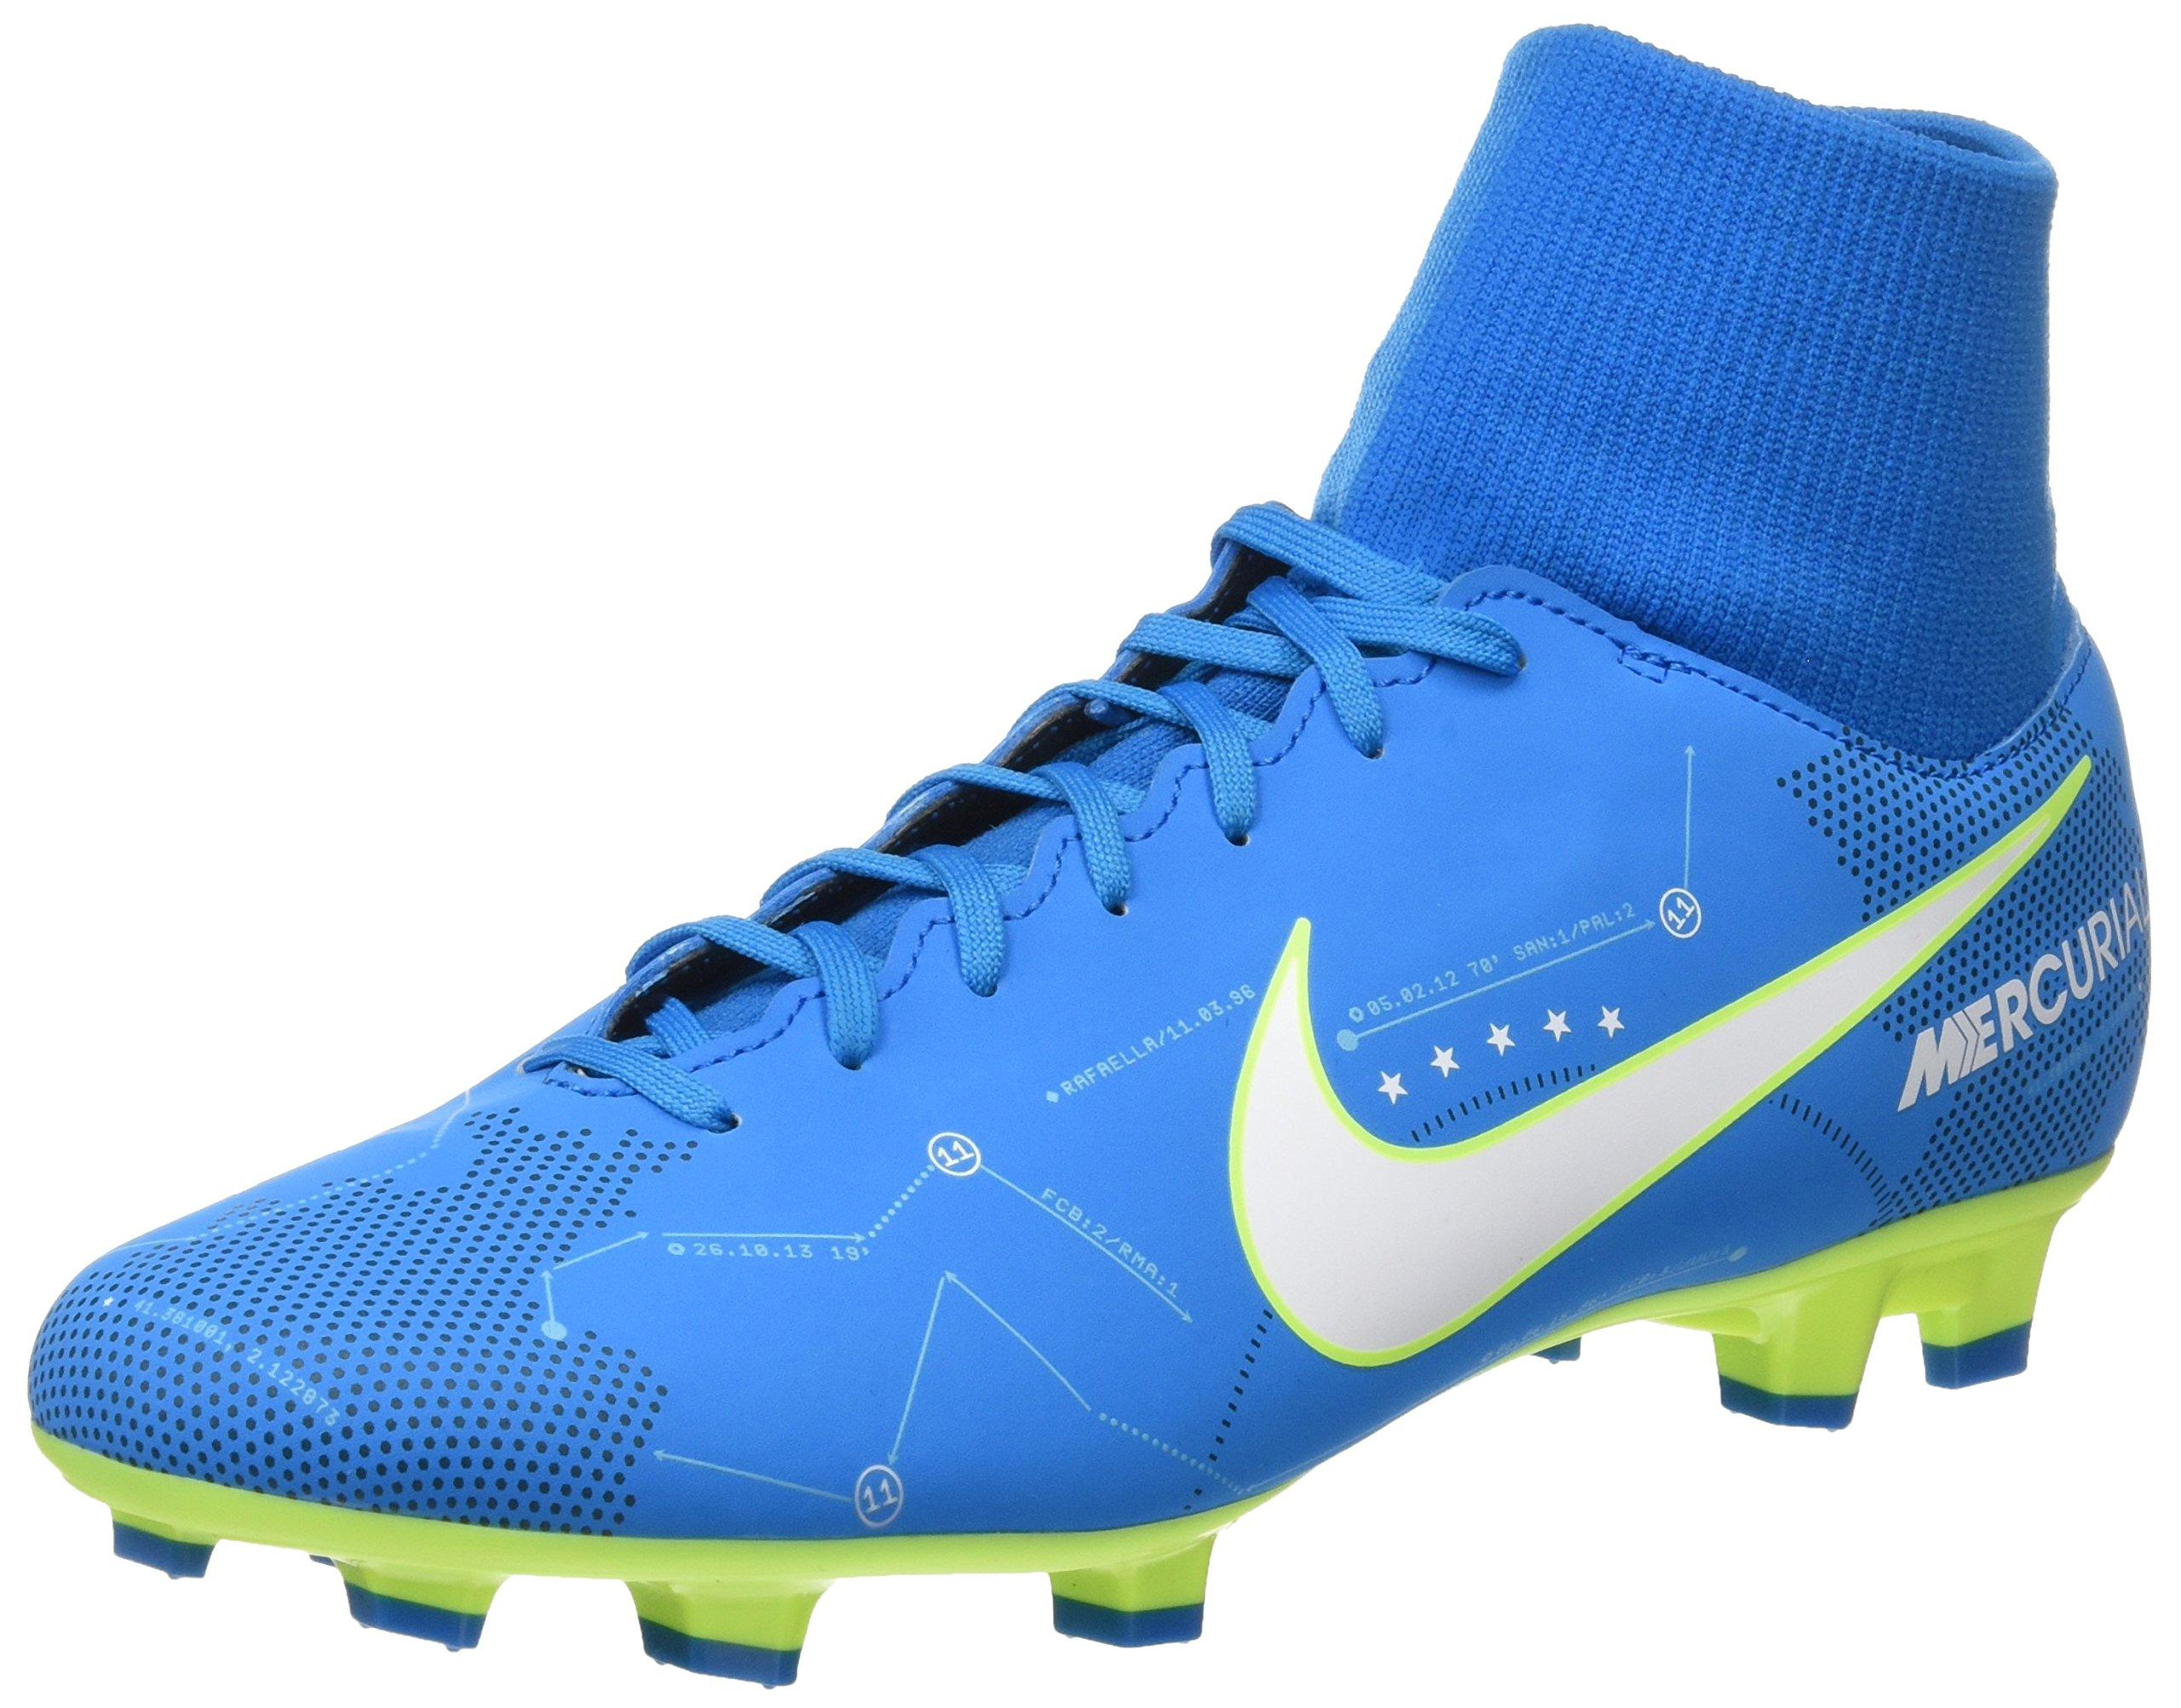 Nike Mercurial Victory VI DF Njr FG Mens Football Boots 921506 Soccer Cleats (UK 9.5 US 10.5 EU 44.5, Blue Orbit White 400)